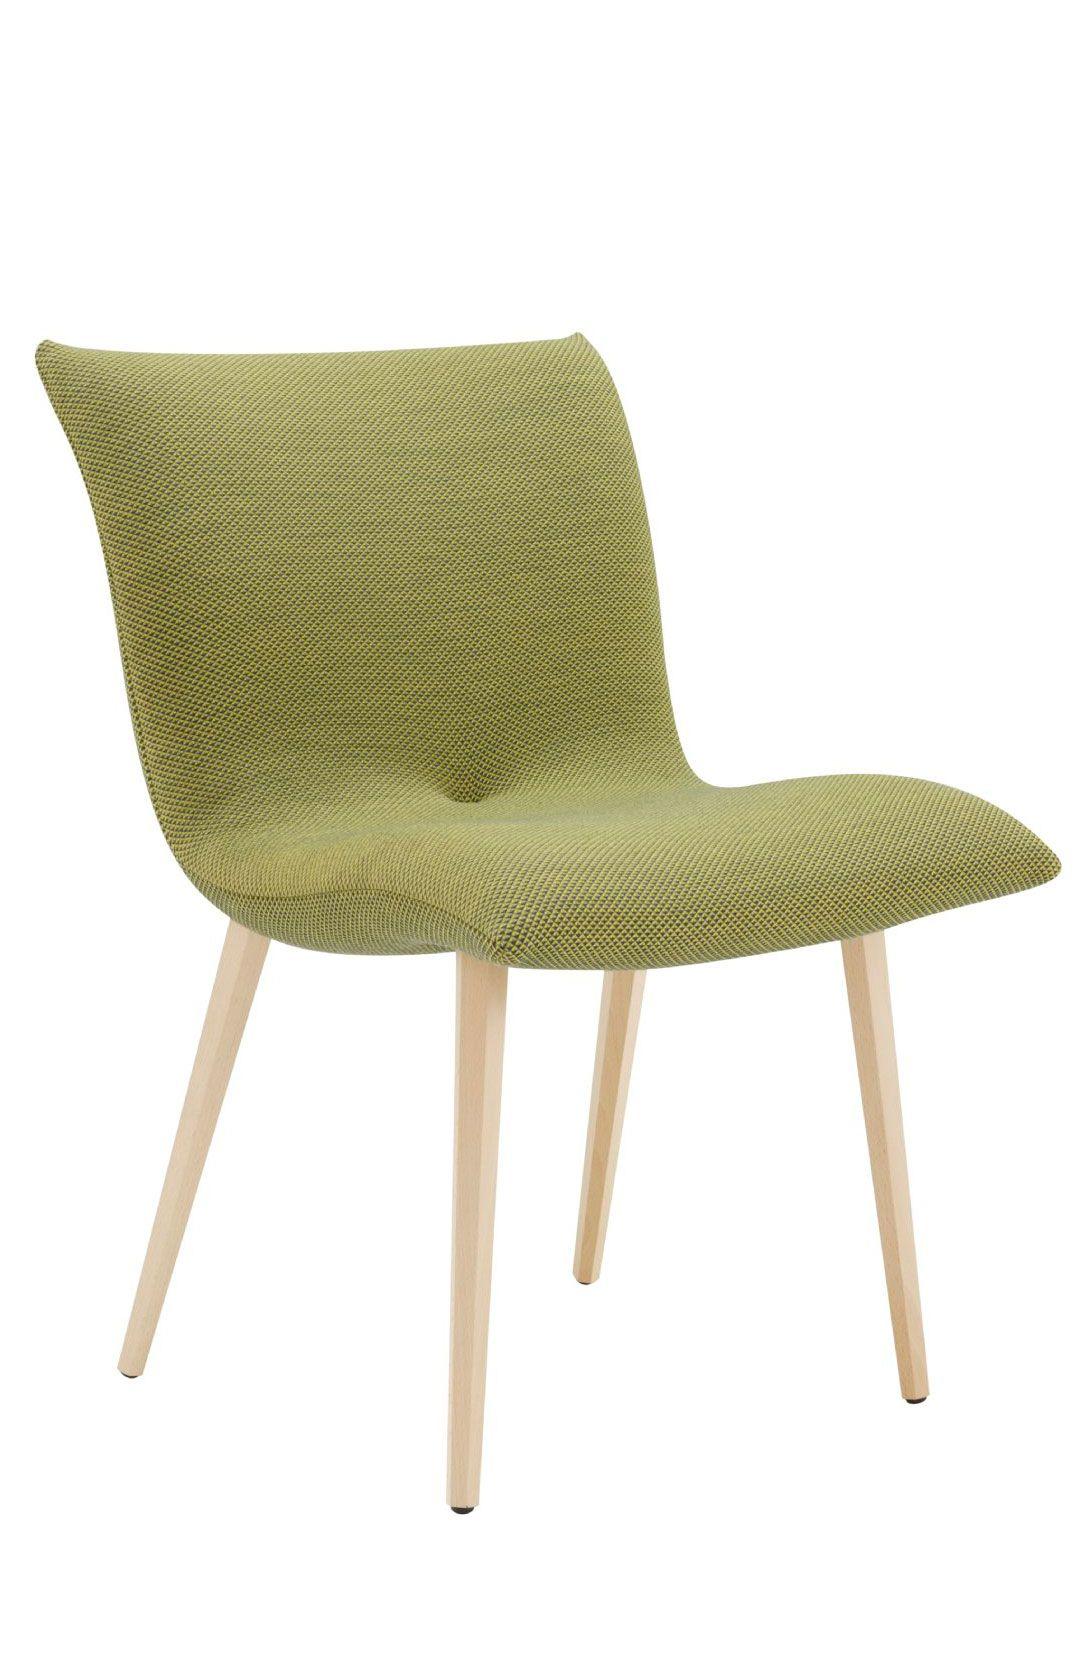 Ligne Roset Eetkamerstoel Calin.Calin Dining Chair Designed By Pascal Mourgue For Ligne